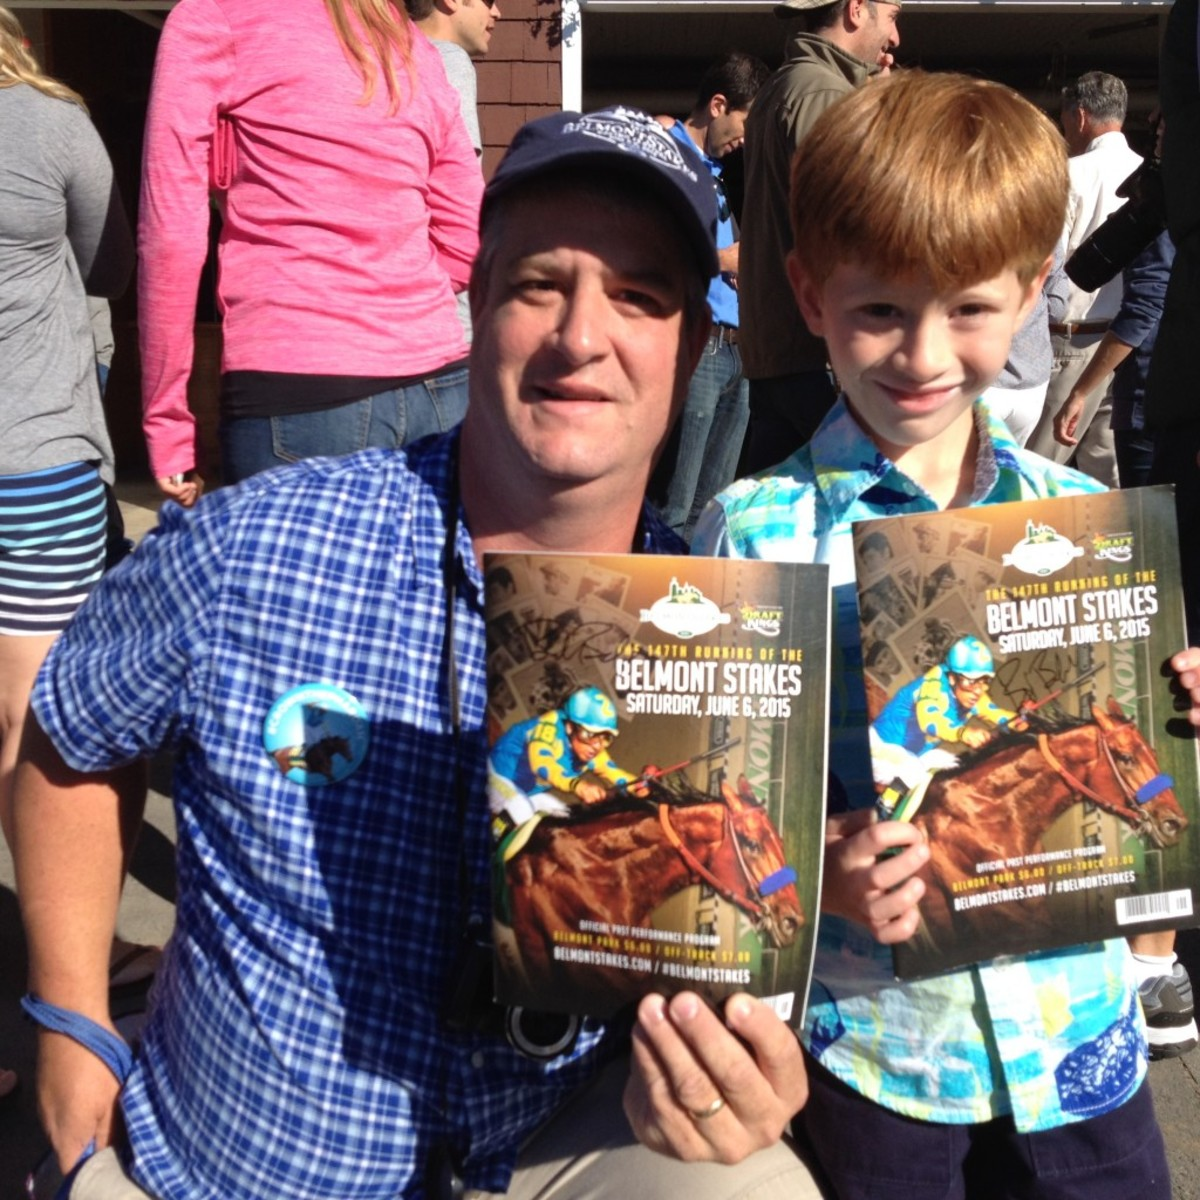 Joe Deucker and his son, Jack, show off Belmont Stakes programs signed by American Pharoah trainer Bob Baffert.